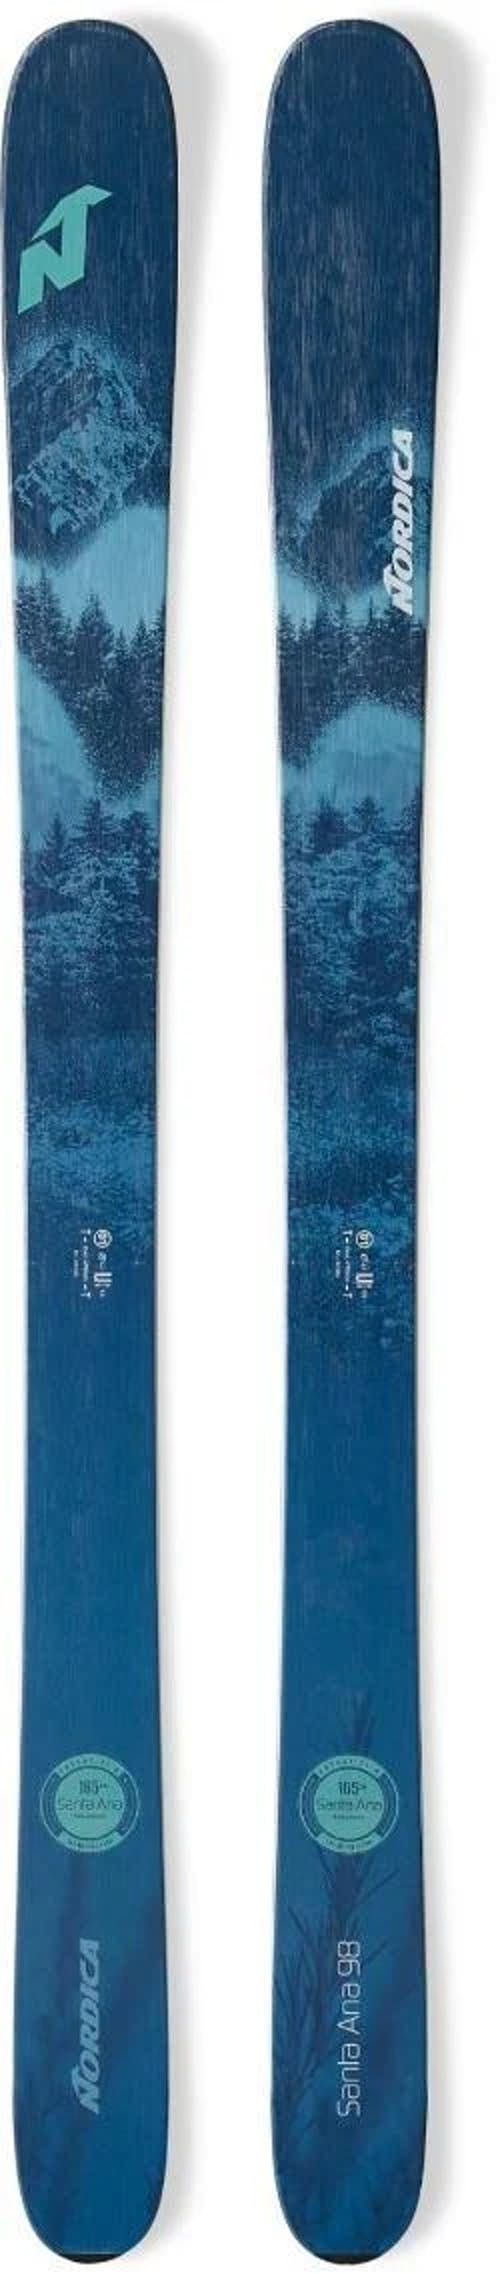 Nordica Santa ANA 98 Skis · 2021